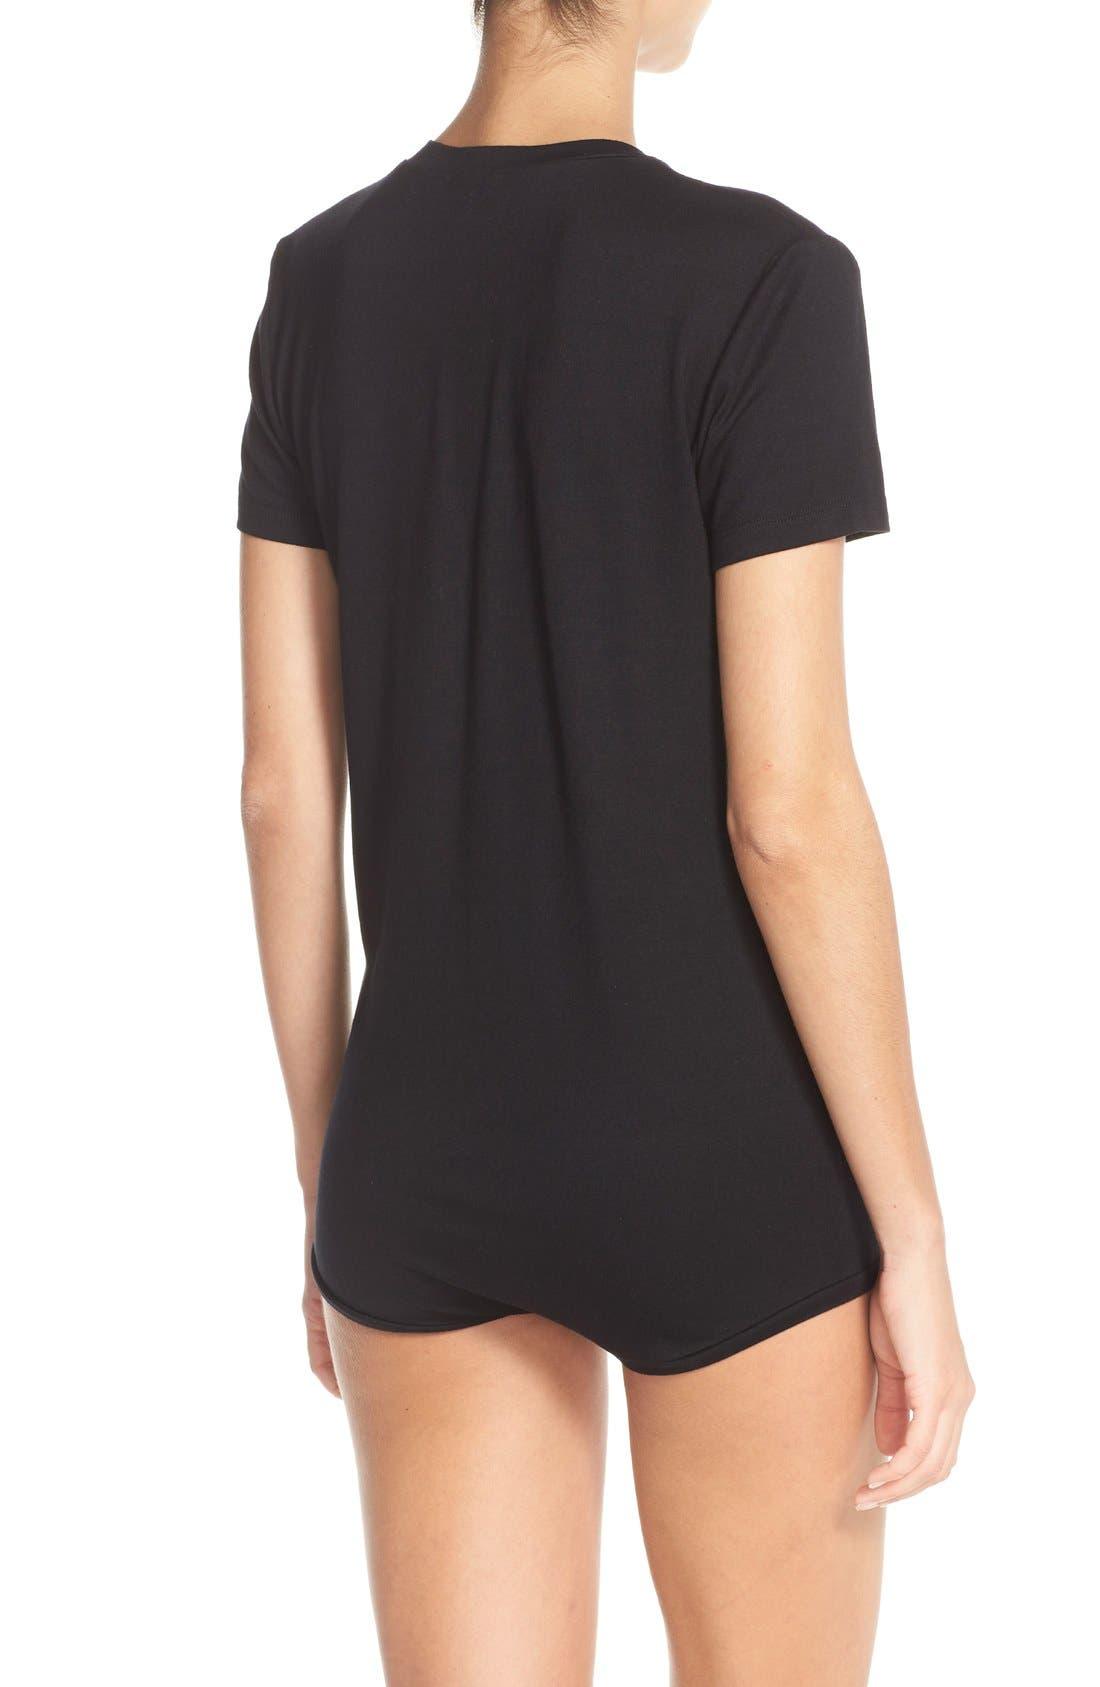 Alternate Image 2  - ALIX 'Essex' Tee Bodysuit (Nordstrom Exclusive)